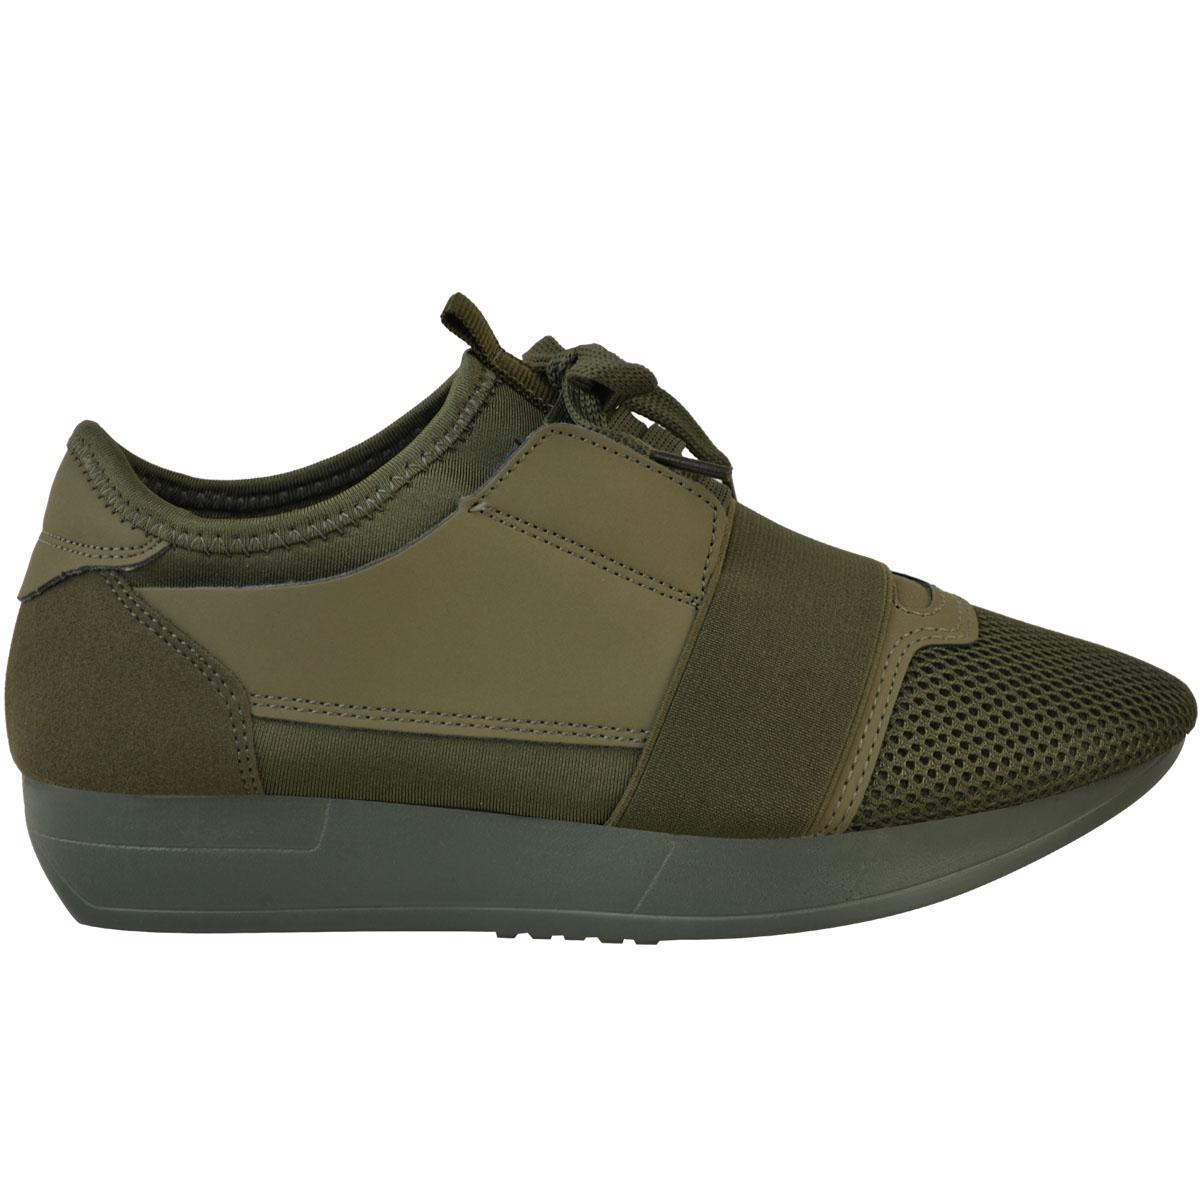 k swiss shoes indonesia bali